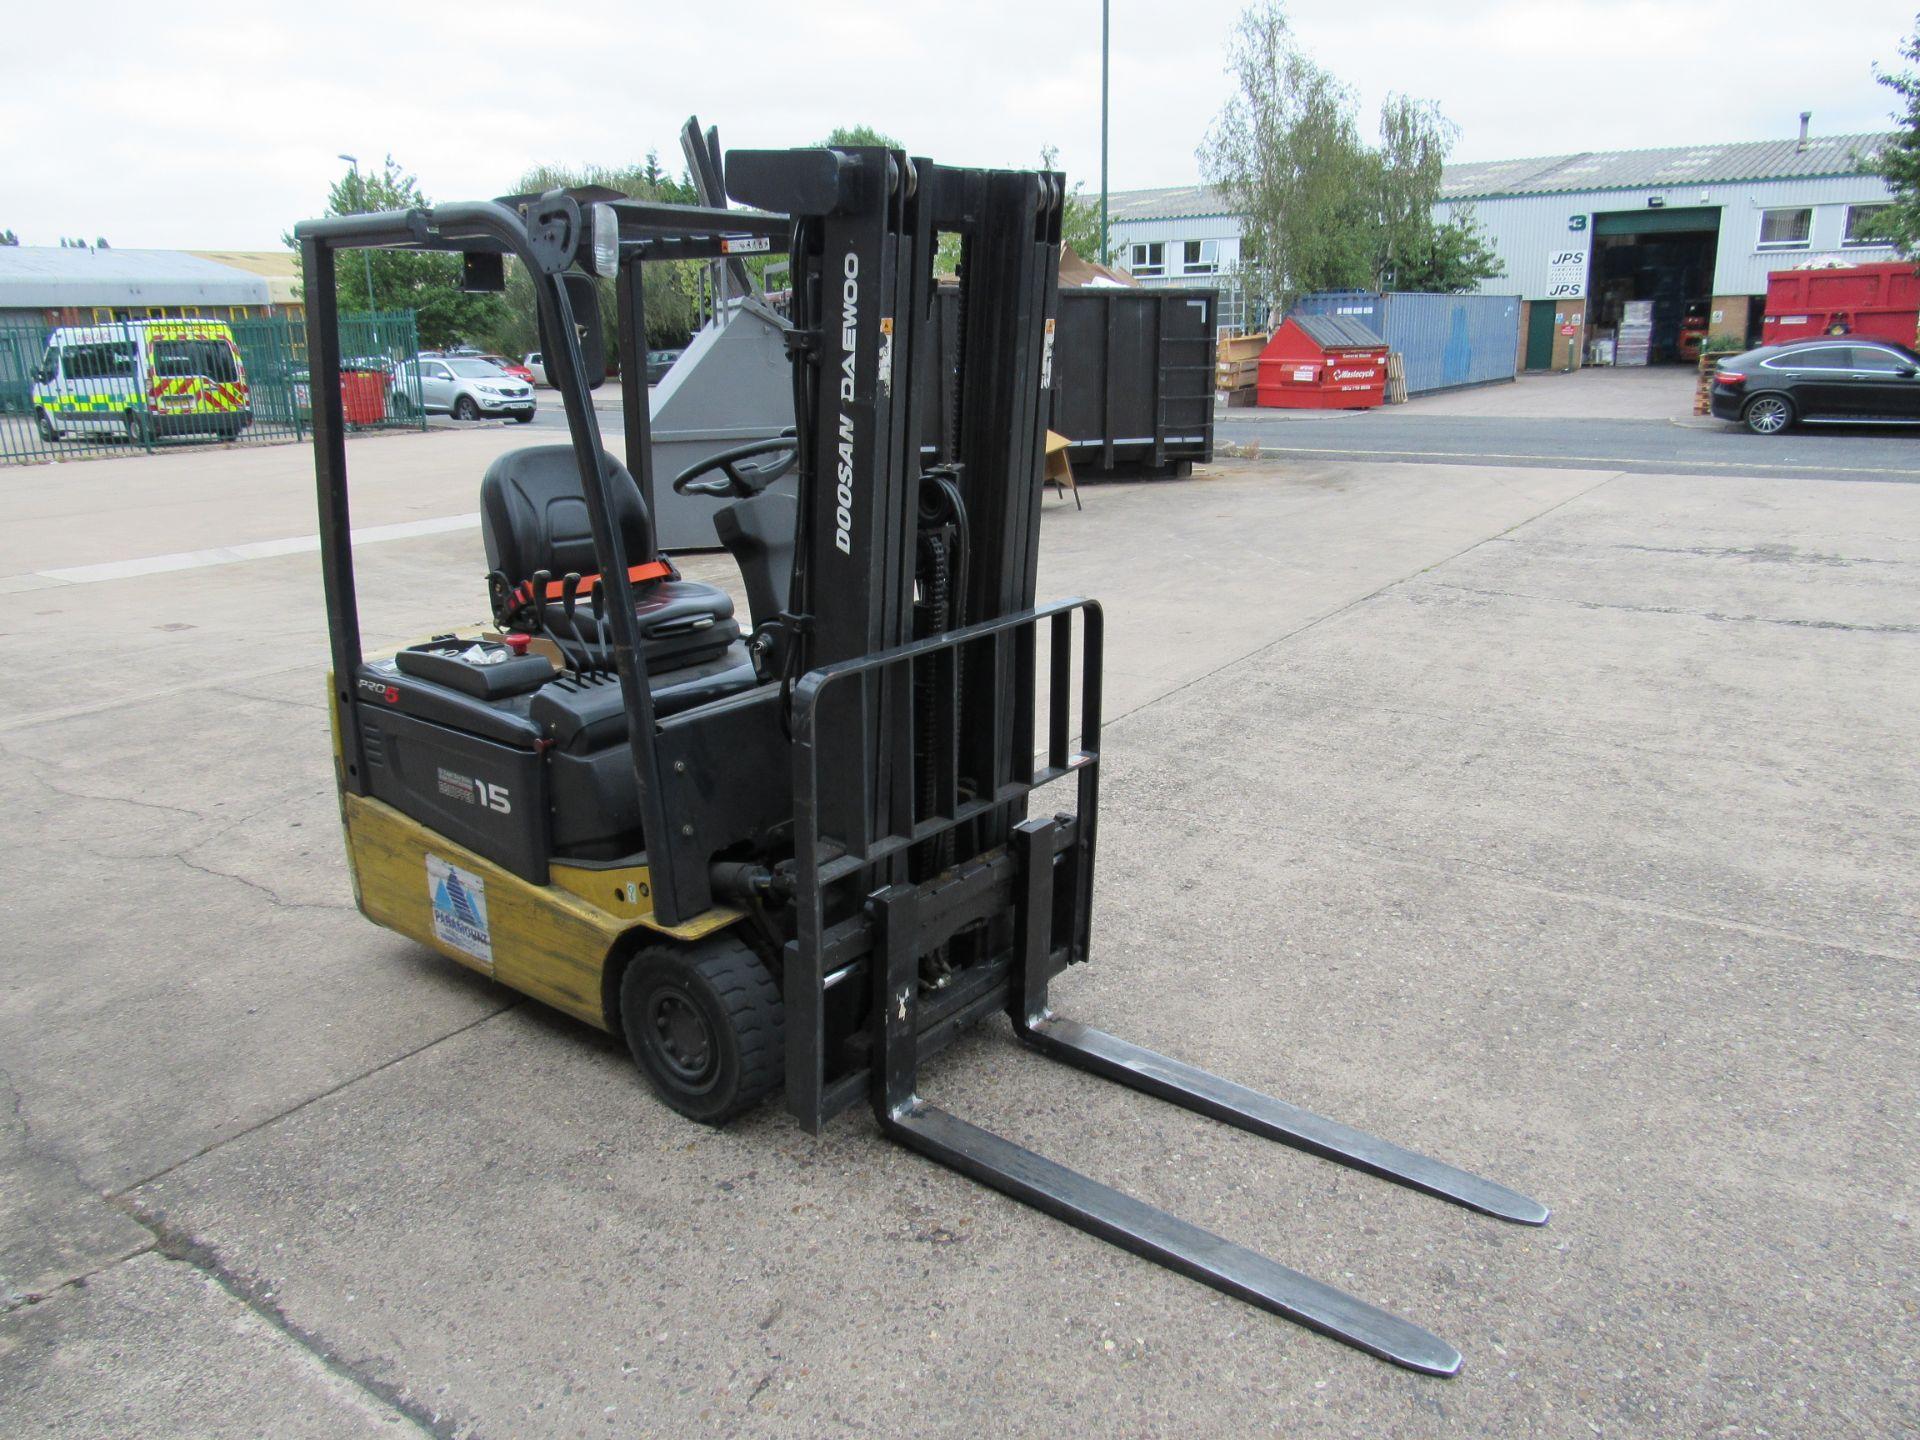 Doosan Daewoo B15T-5 Battery Forklift, 1320kg Capacity, 2278 Hours, Triple Mast, Side Shift, 2007,